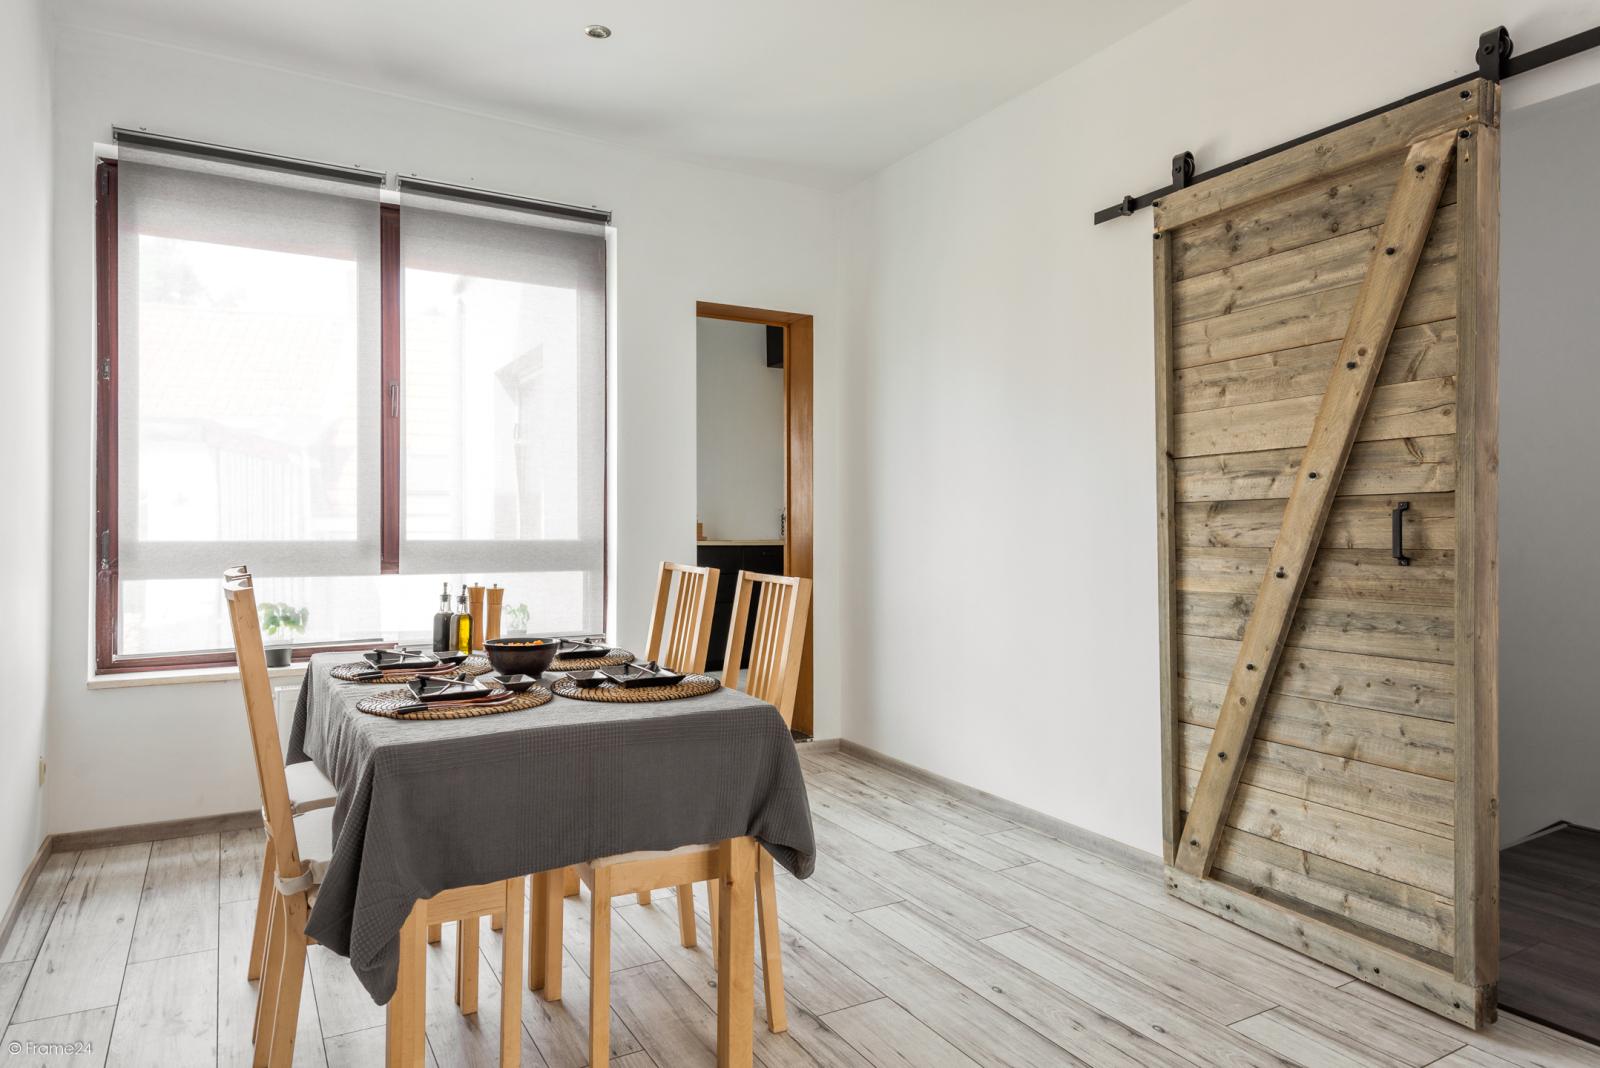 Zeer mooie bel-étage woning met inpandige garage en gezellige patio! afbeelding 9